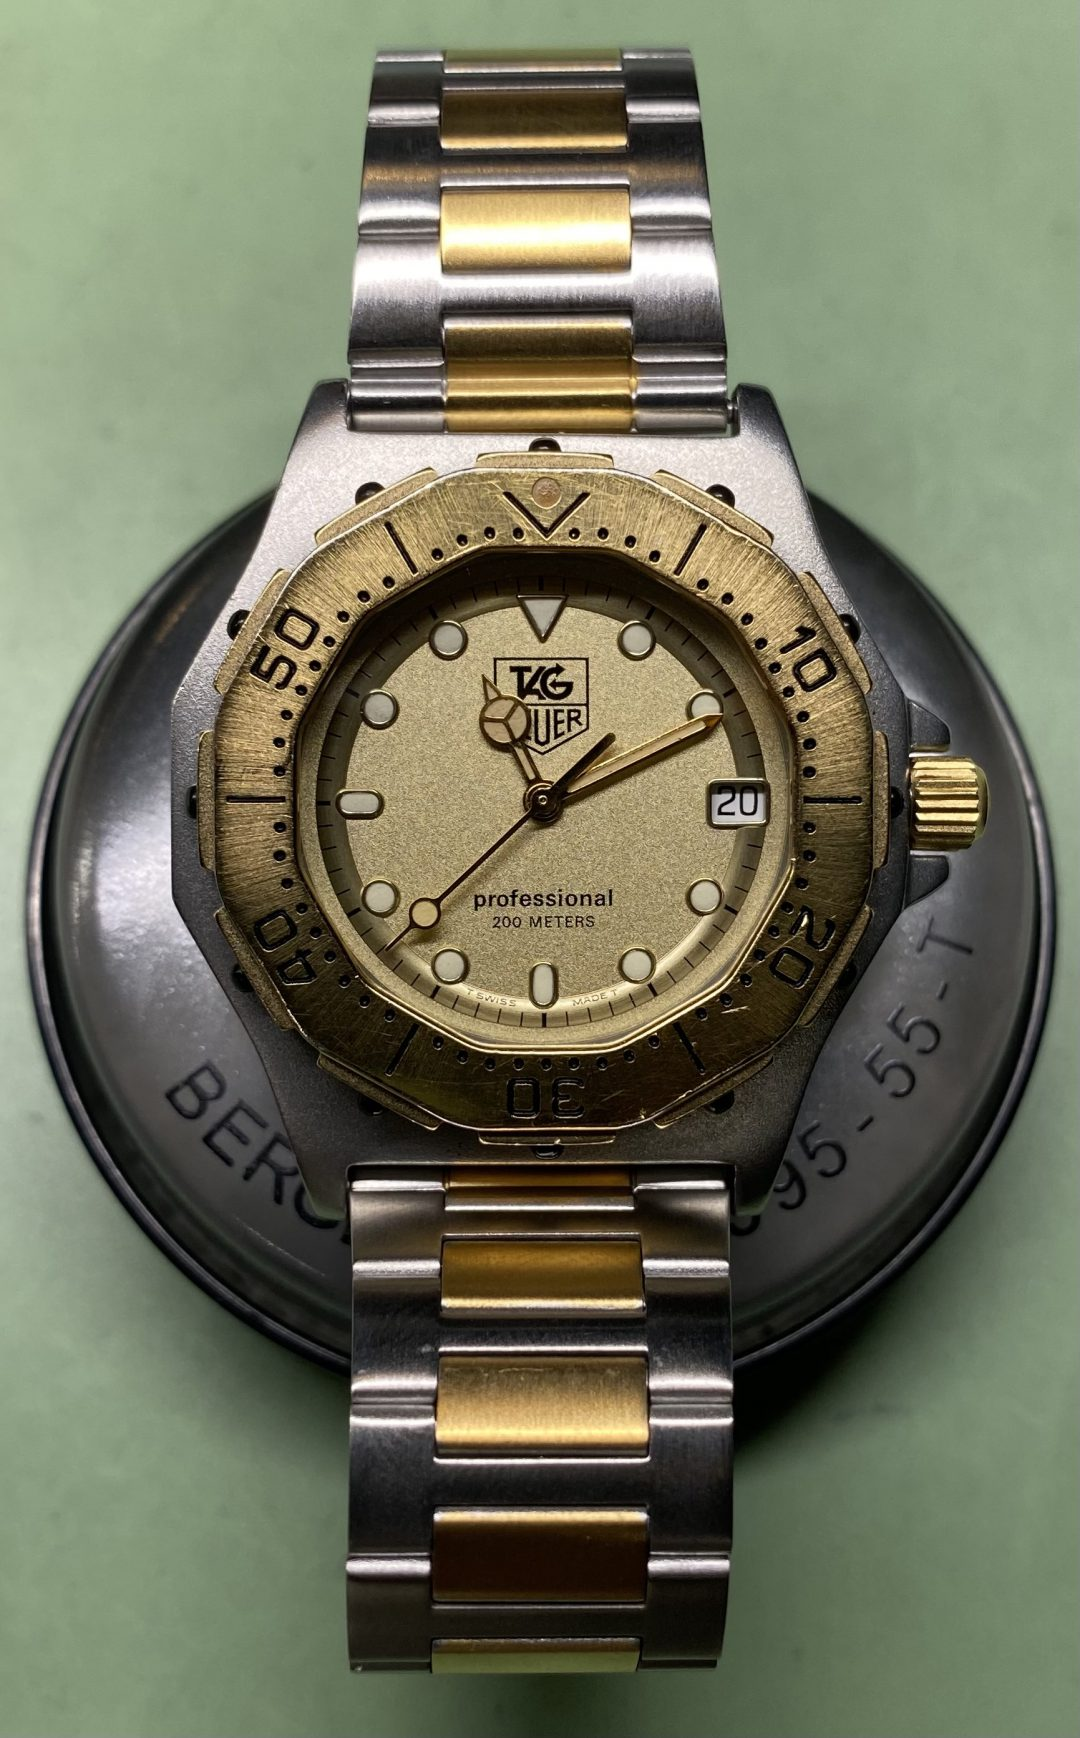 End of lifeの略でクォーツ式時計のバッテリー残量を表示する機能